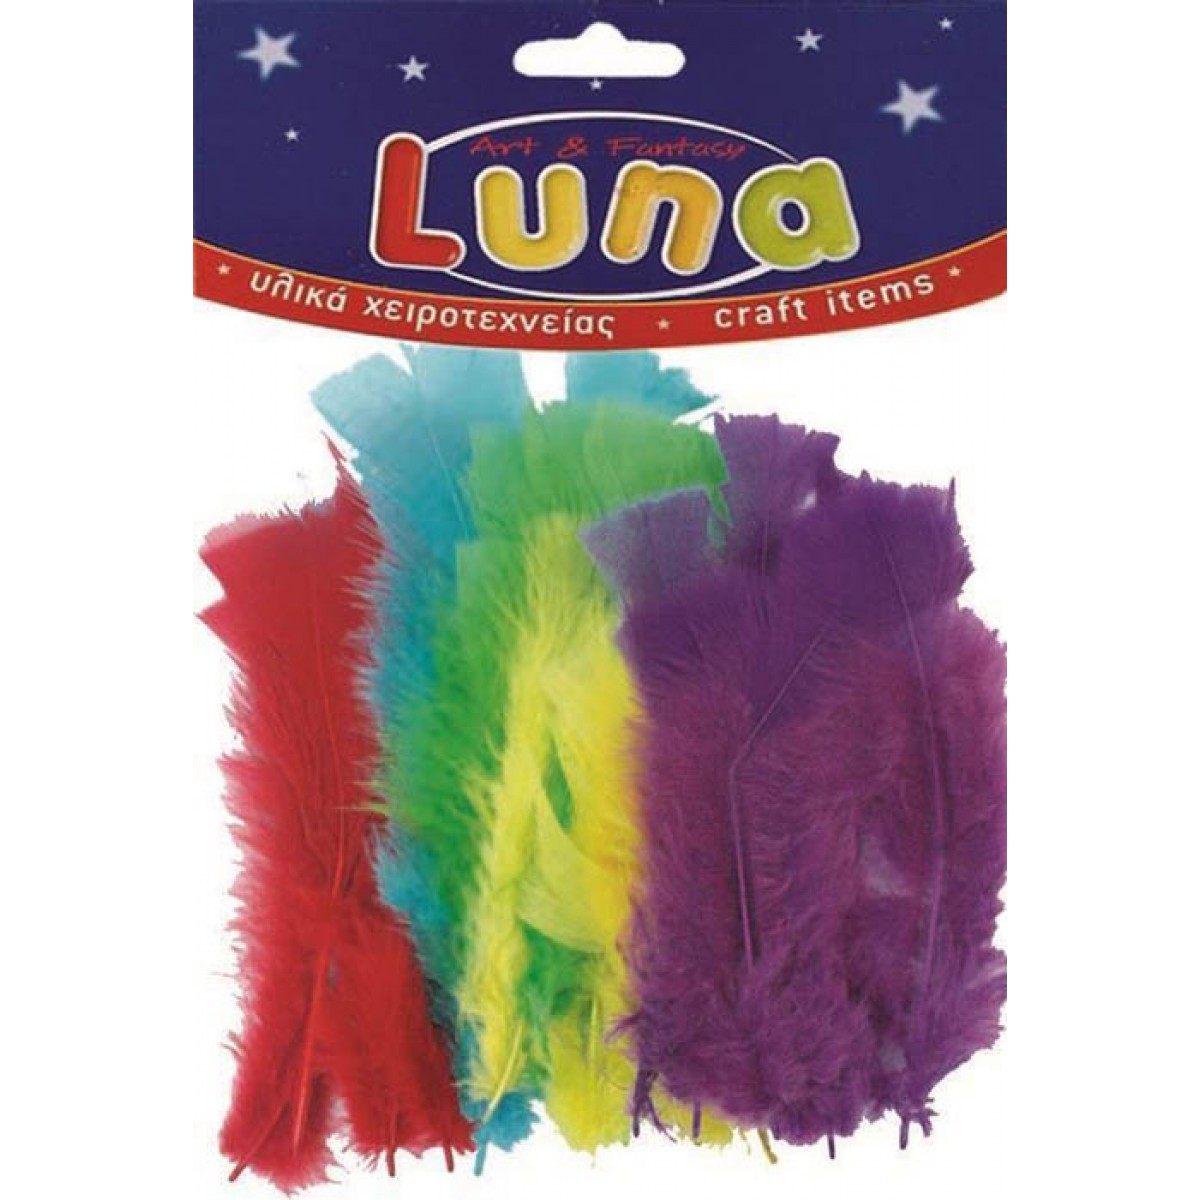 Luna Φτερά (30 Τεμ.) Υλικά Χειροτεχνίας